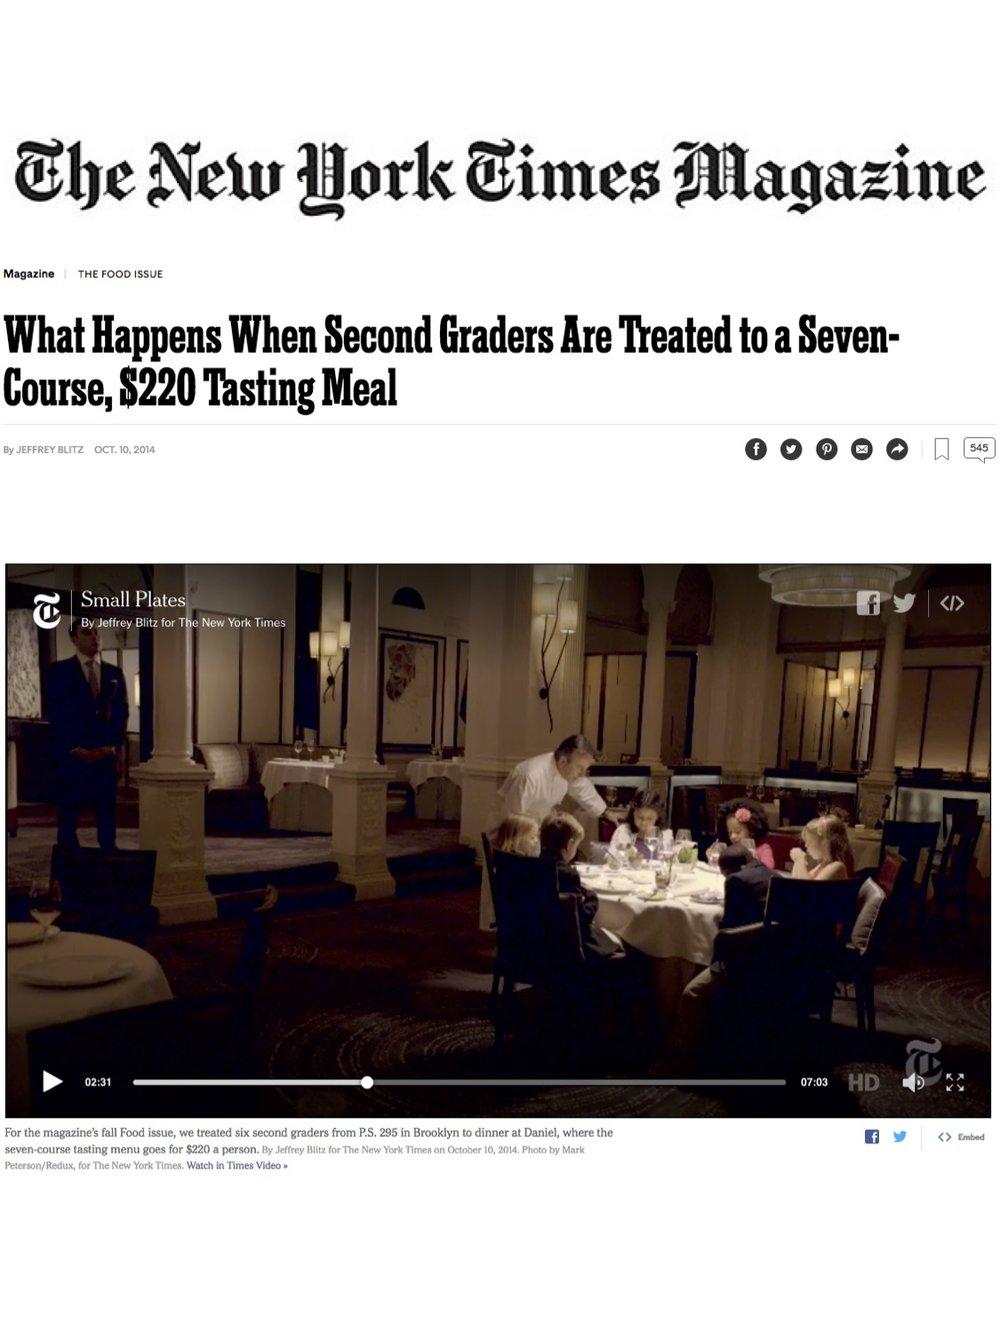 Daniel - NYT Magazine Food Issue, Oct. 2014.jpg